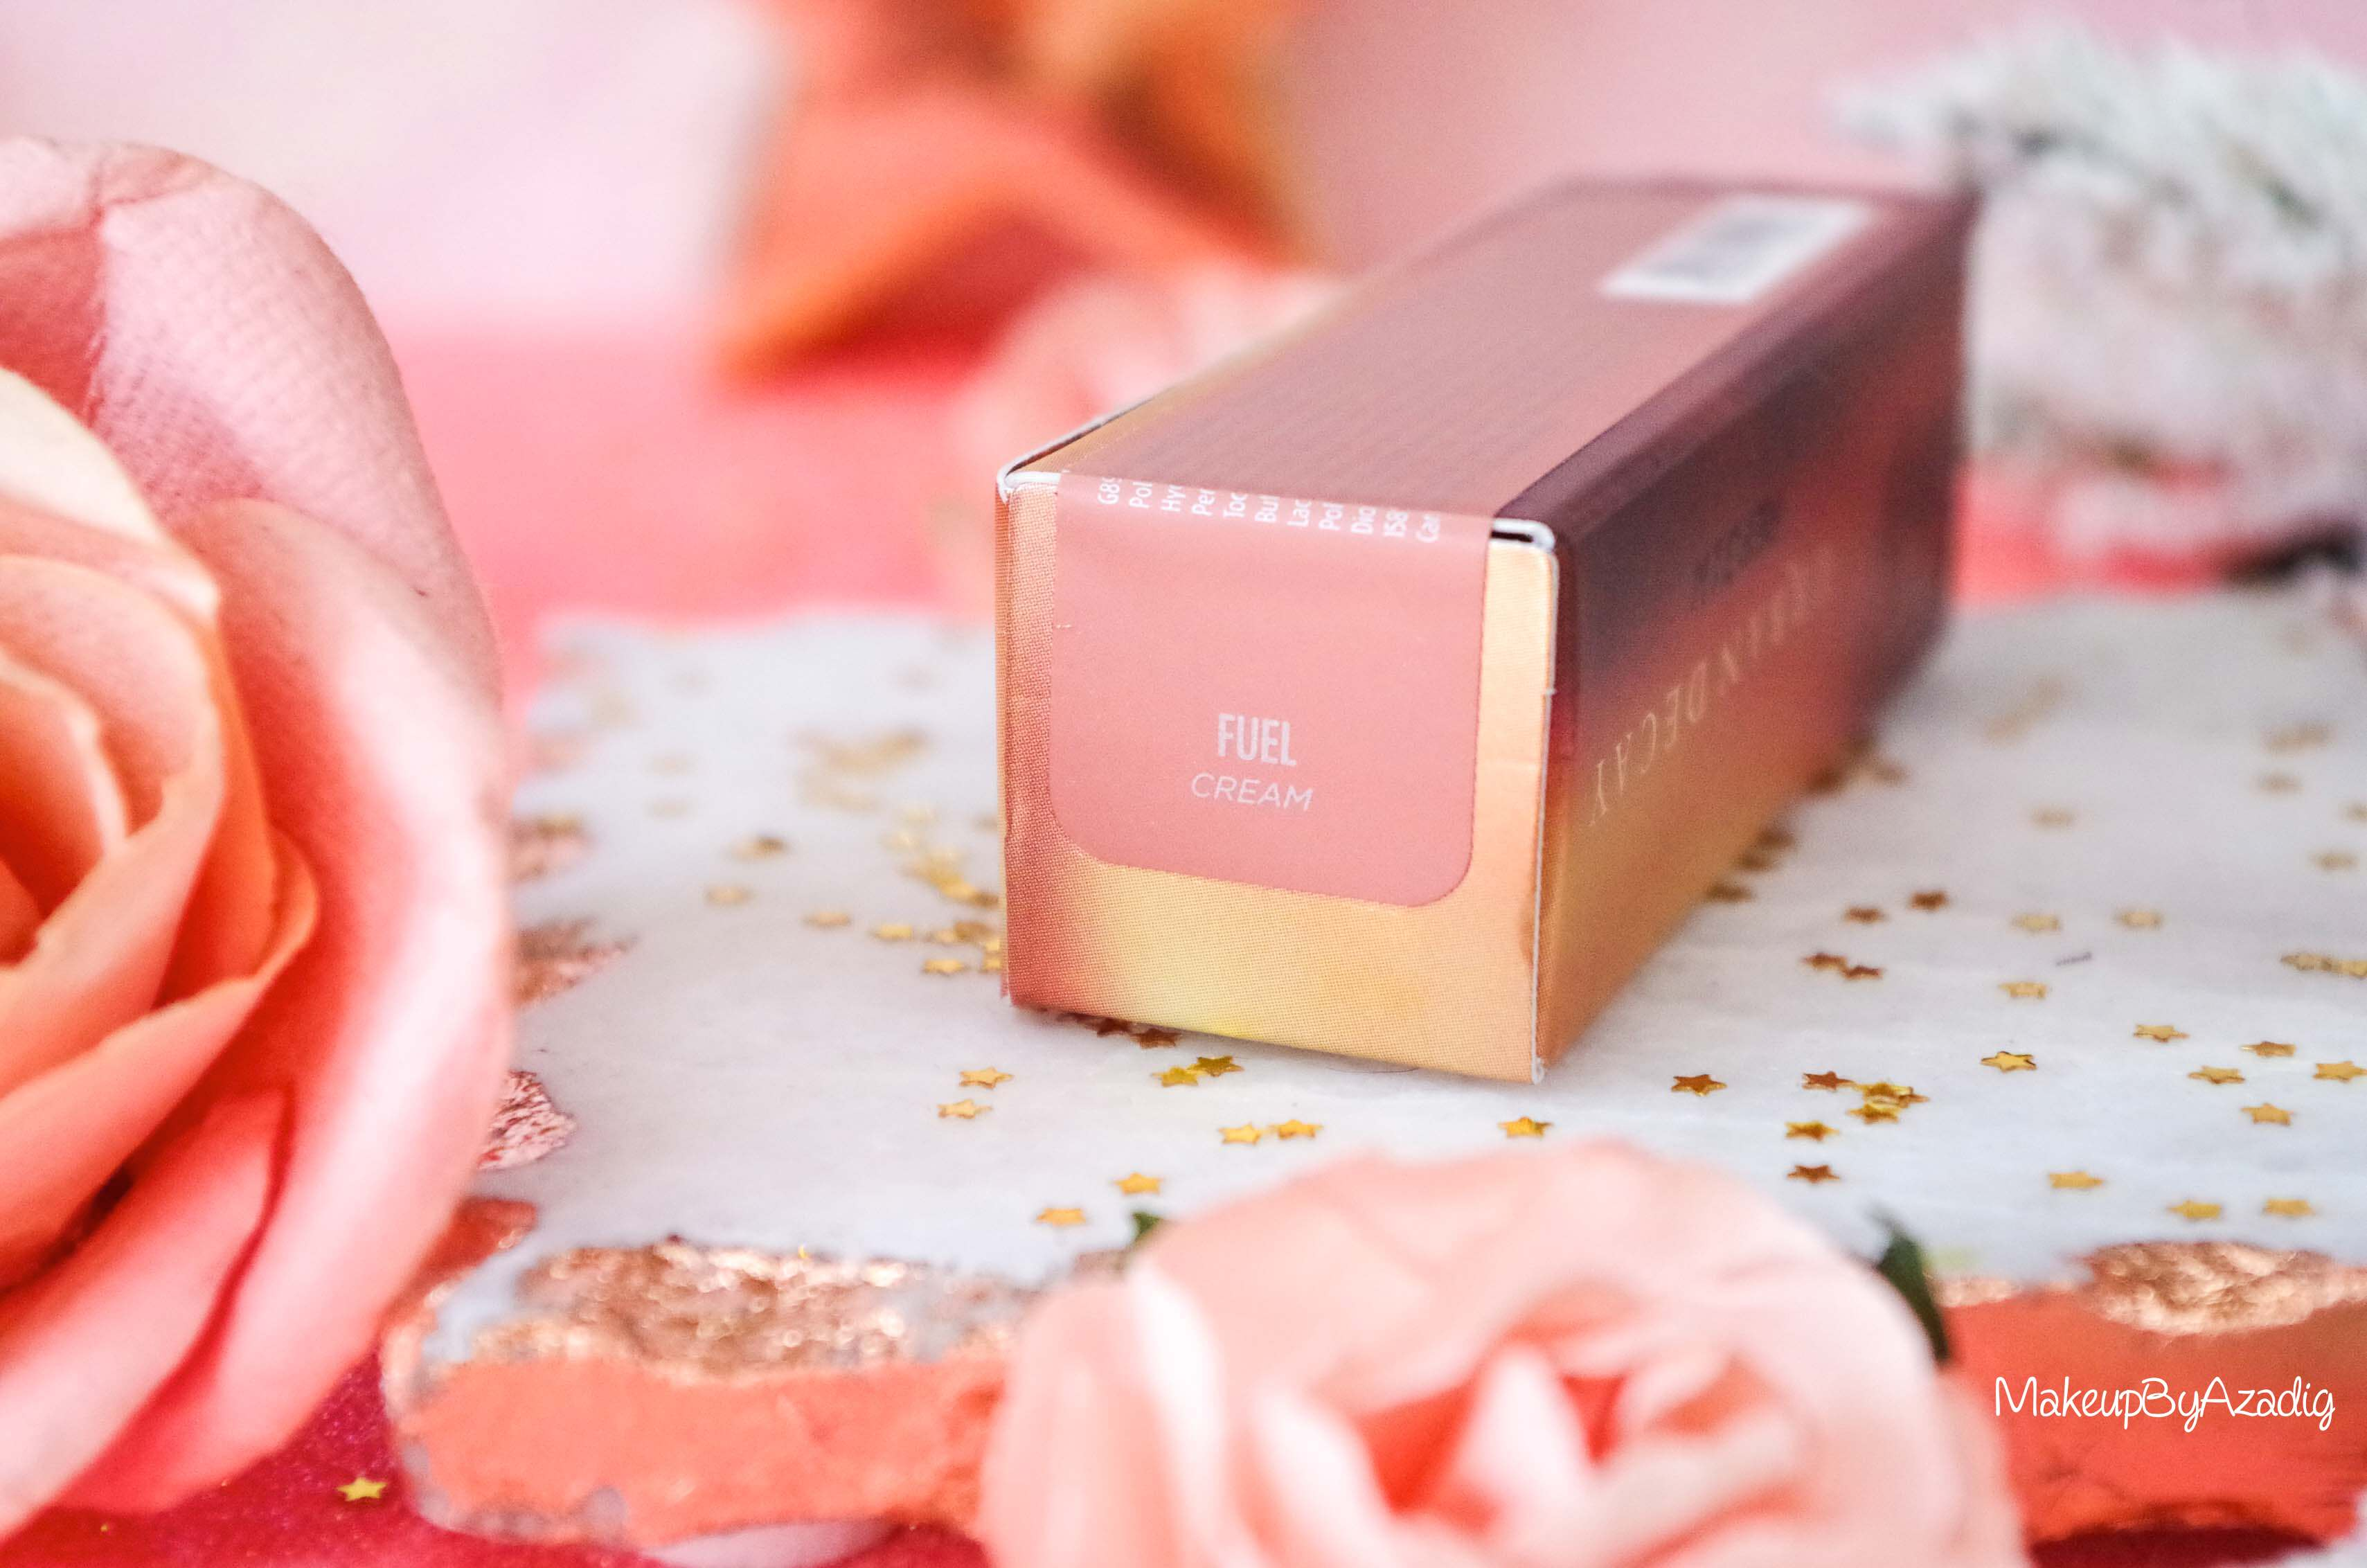 emballage-revue-review-naked-heat-vice-lipstick-fuel-heat-scorched-sephora-urban-decay-makeupbyazadig-prix-avis-troyes